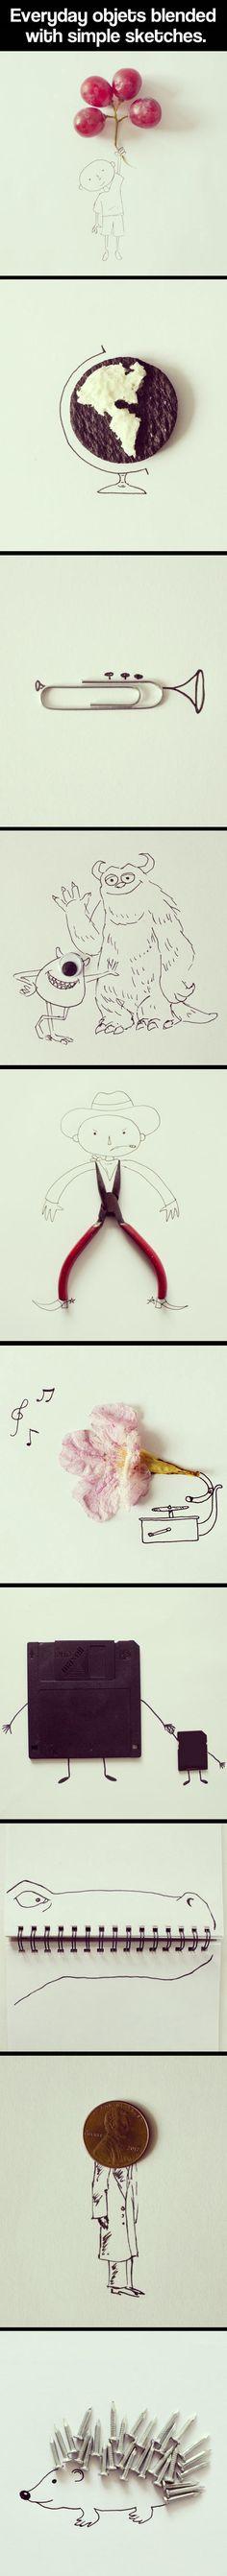 Creative sketches